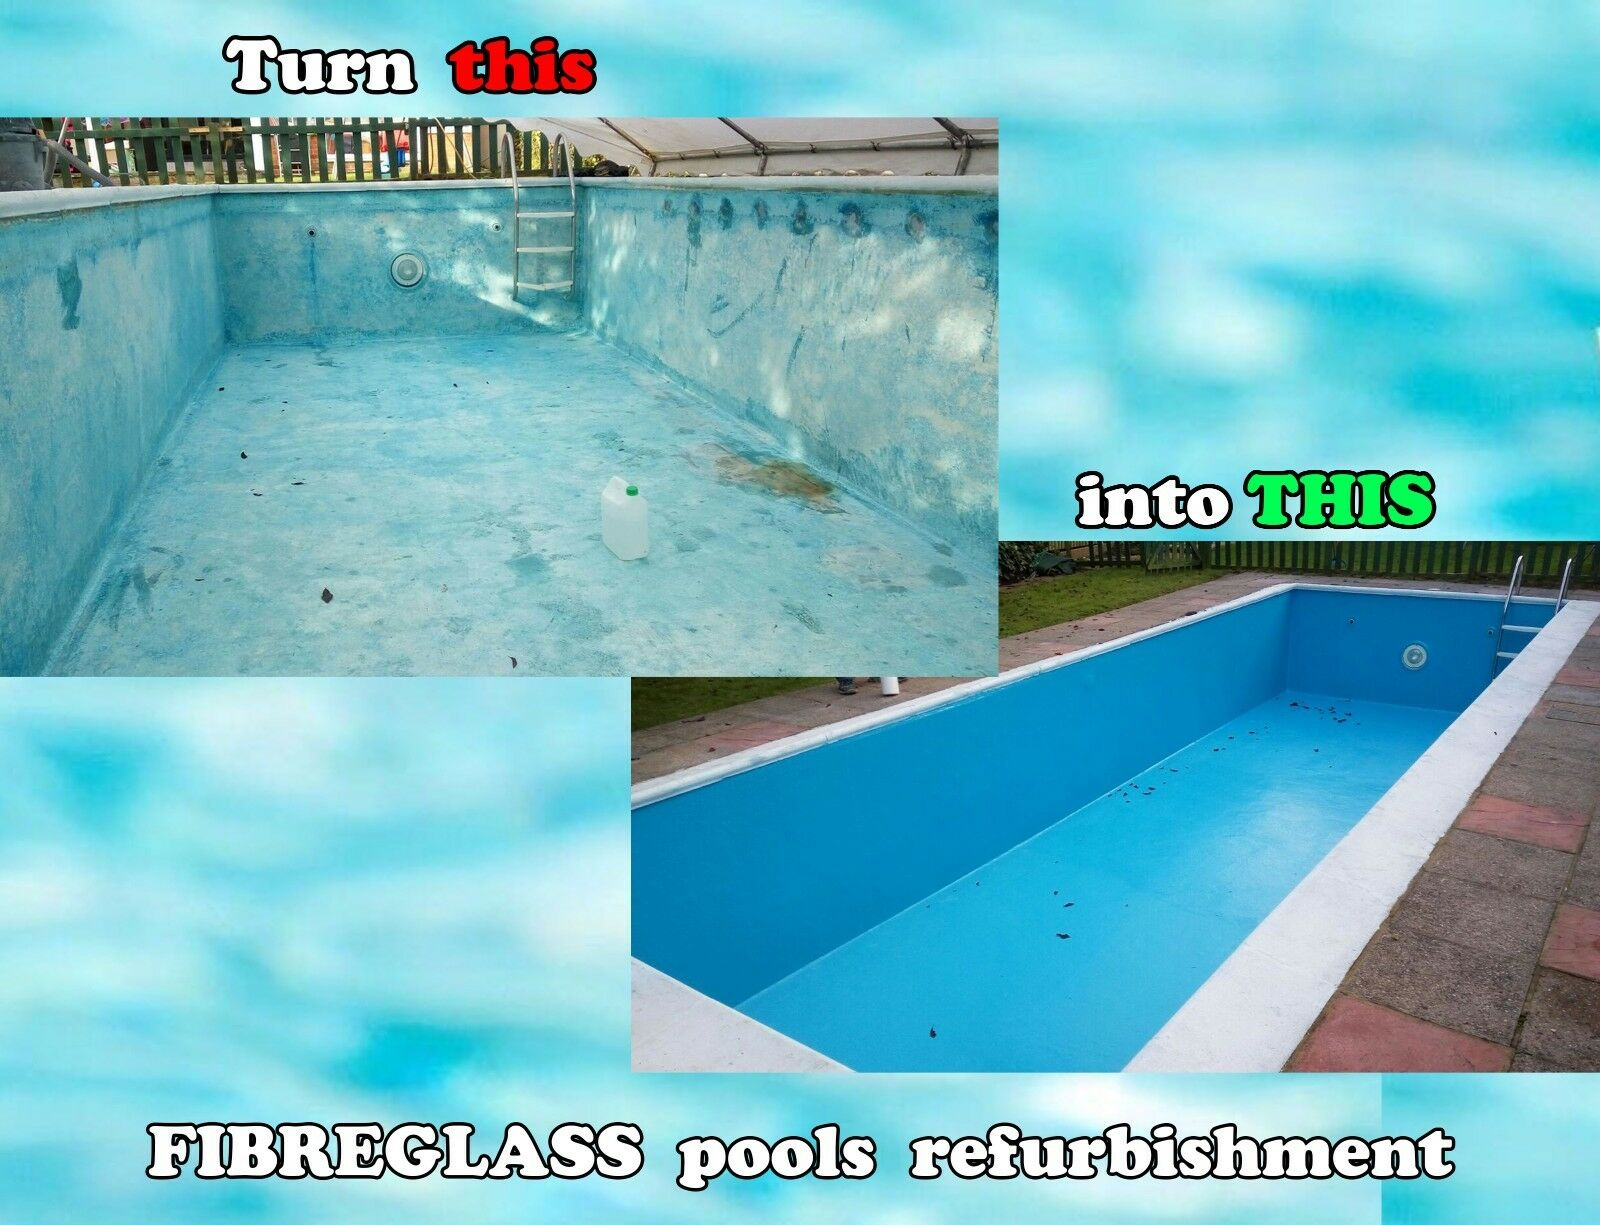 FIBREGLASS SWIMMING POOL refurbishment renovation restoration Any colour /m2